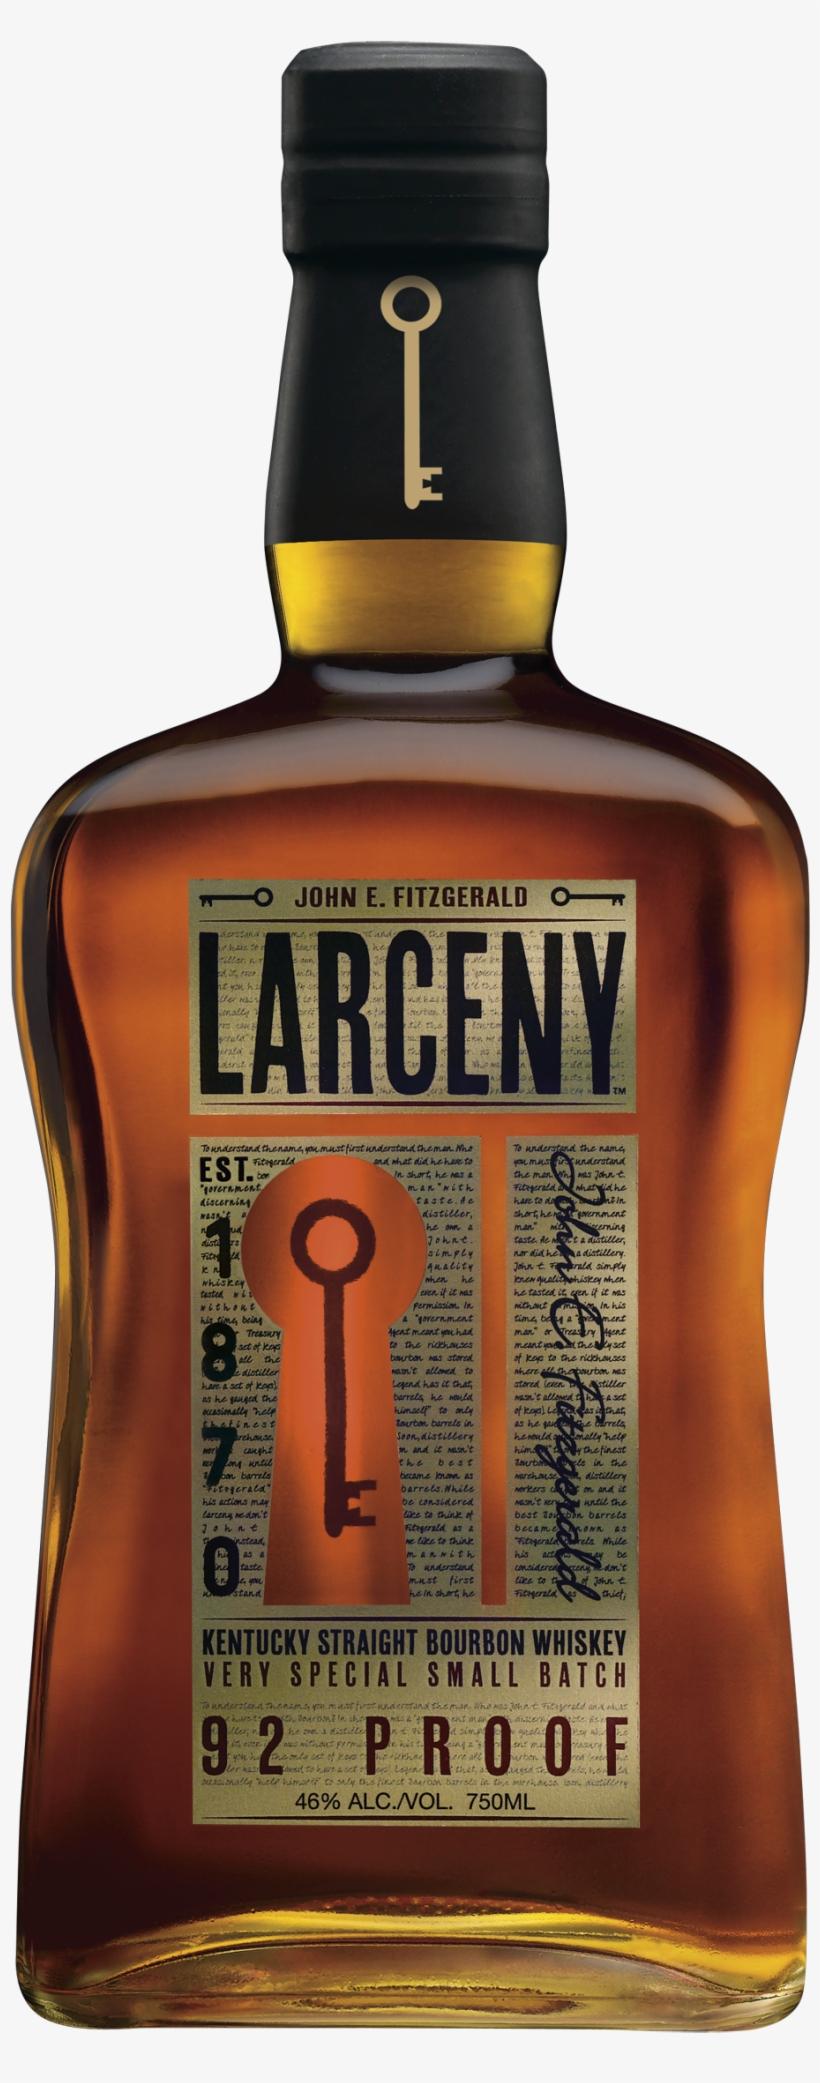 What - Larceny Bourbon Whiskey - 750 Ml Bottle, transparent png #3107567